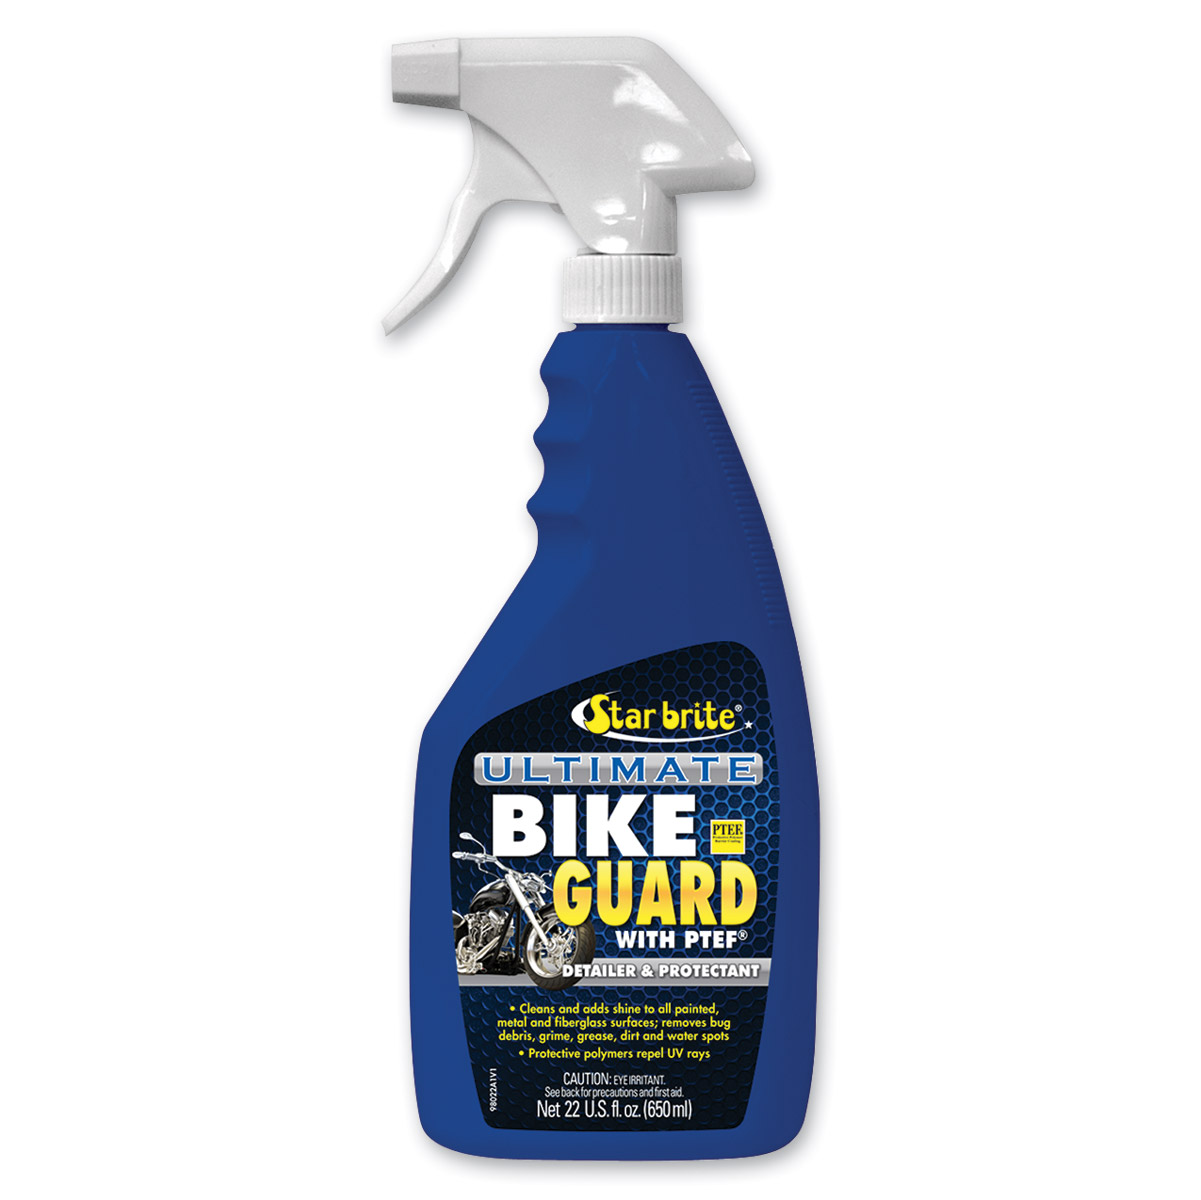 Starbrite Bike Guard Detailer